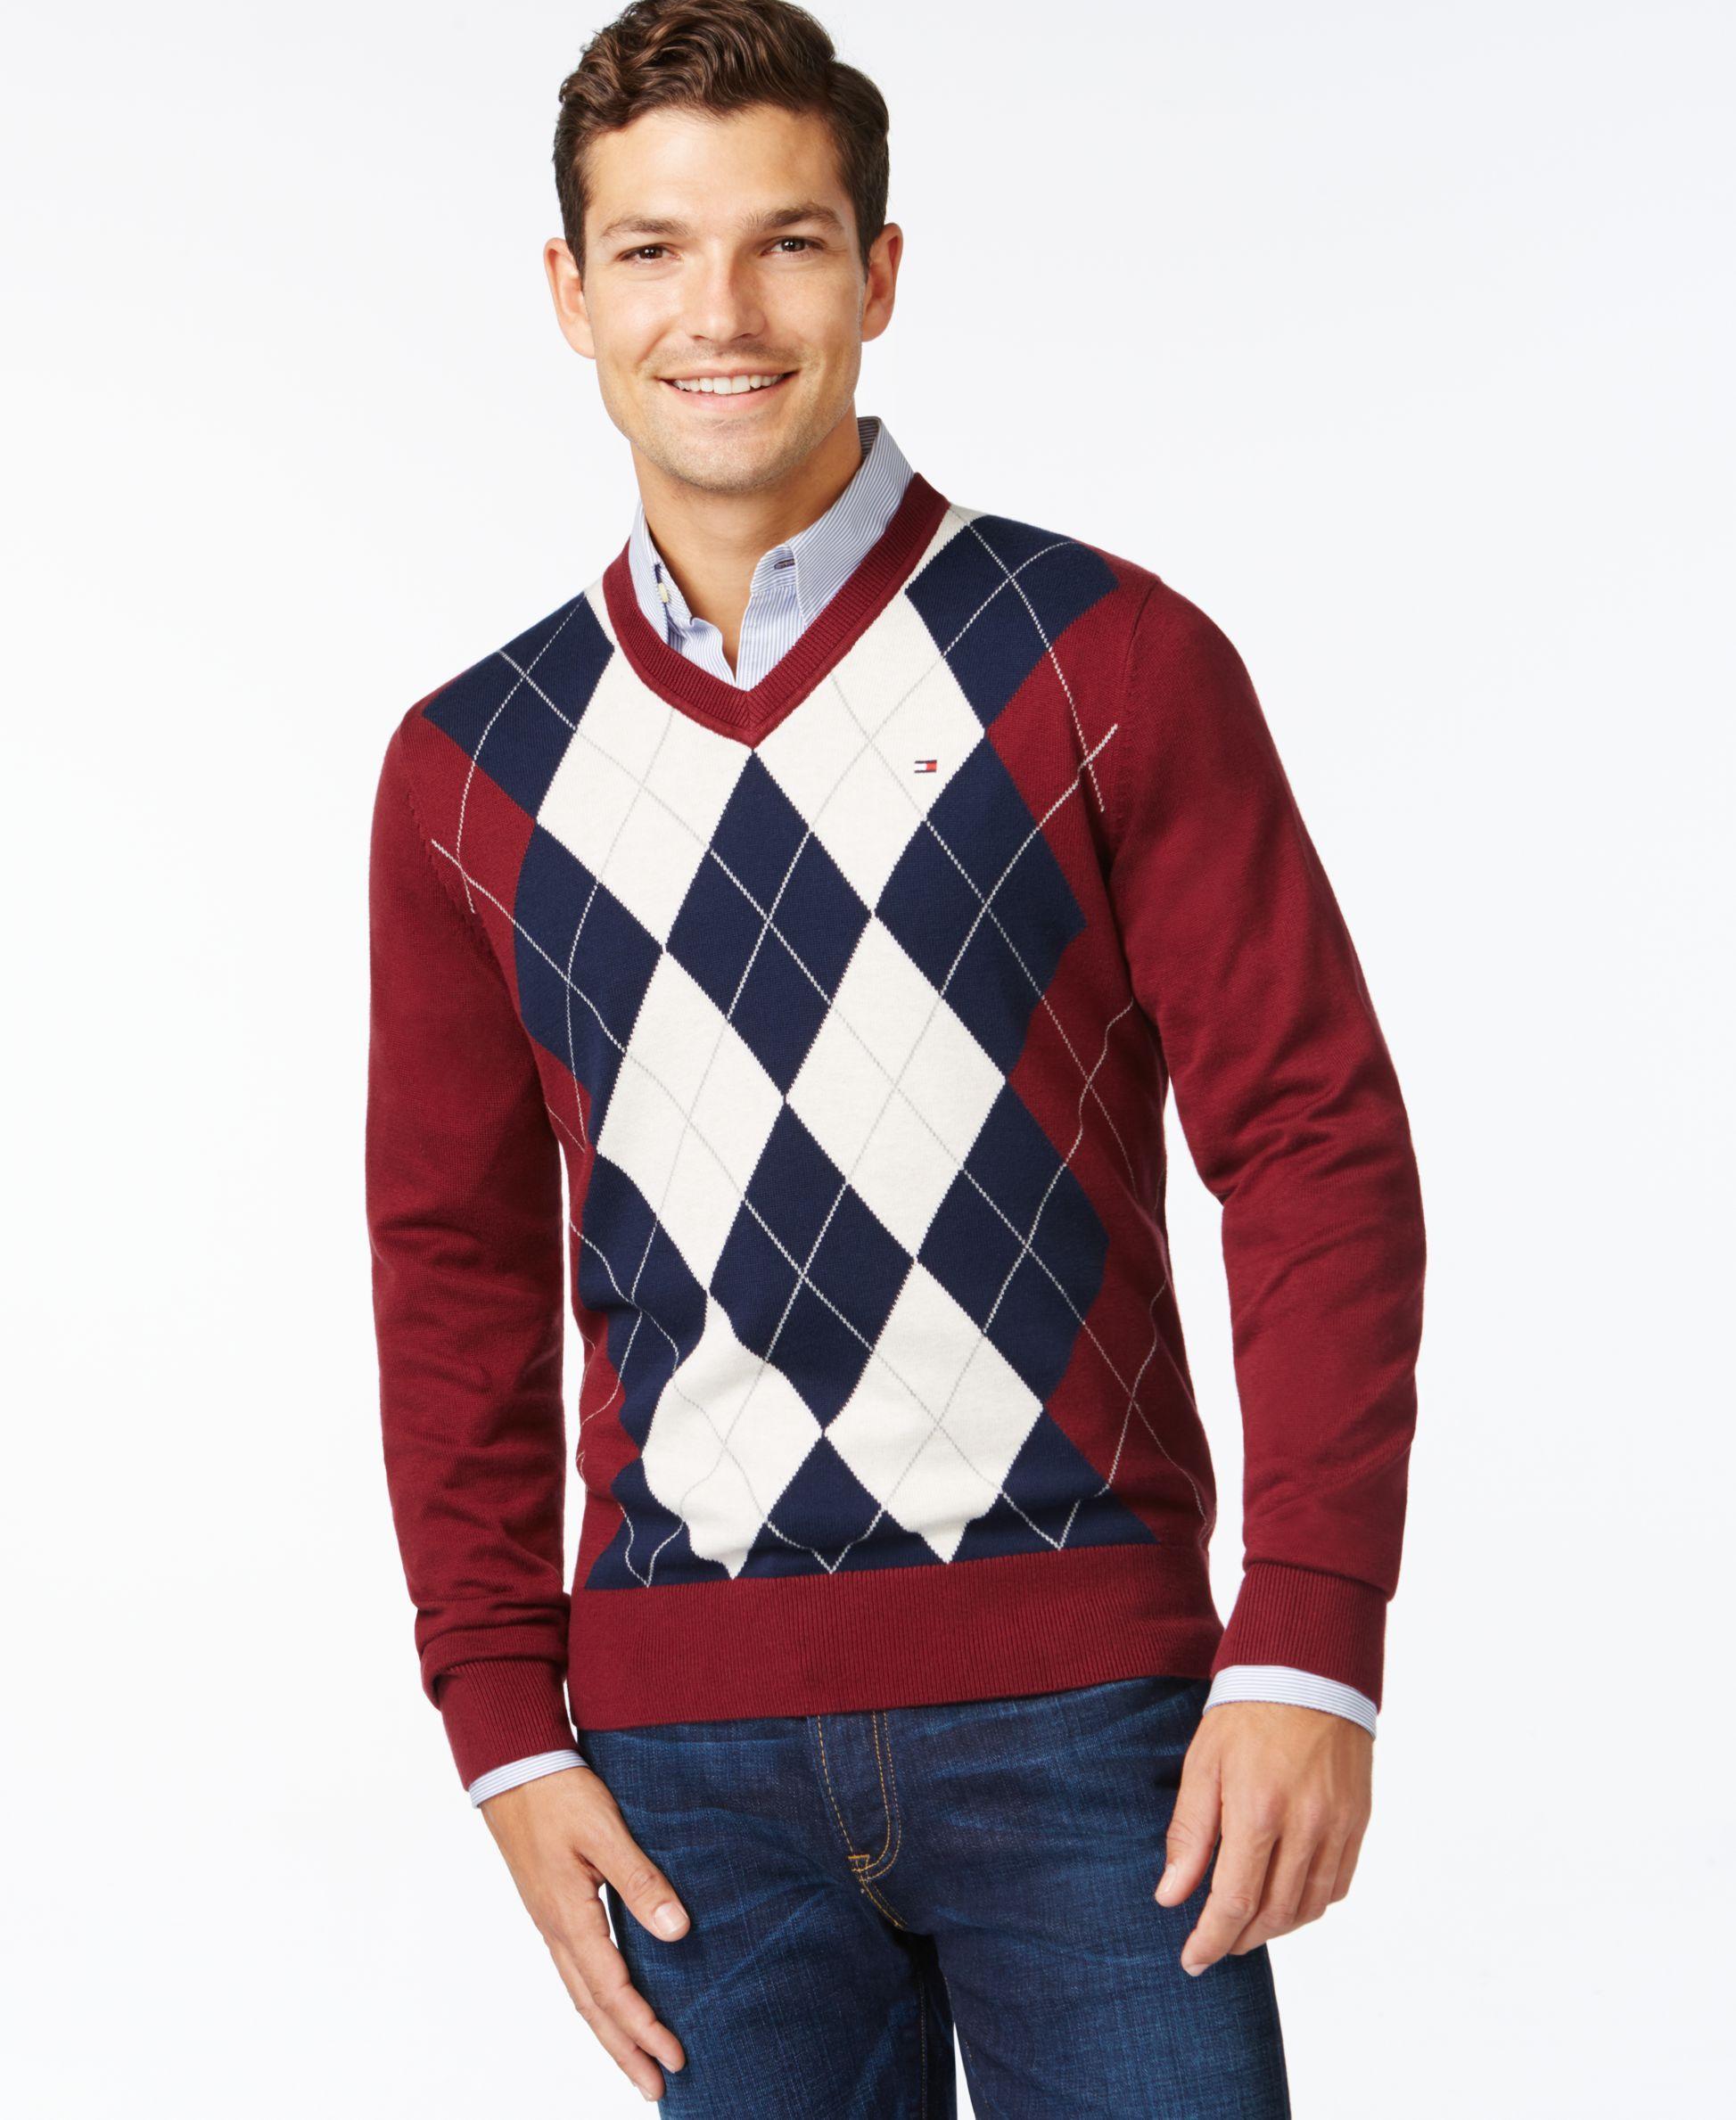 Tommy Hilfiger Signature Argyle V-Neck Sweater | Products ...